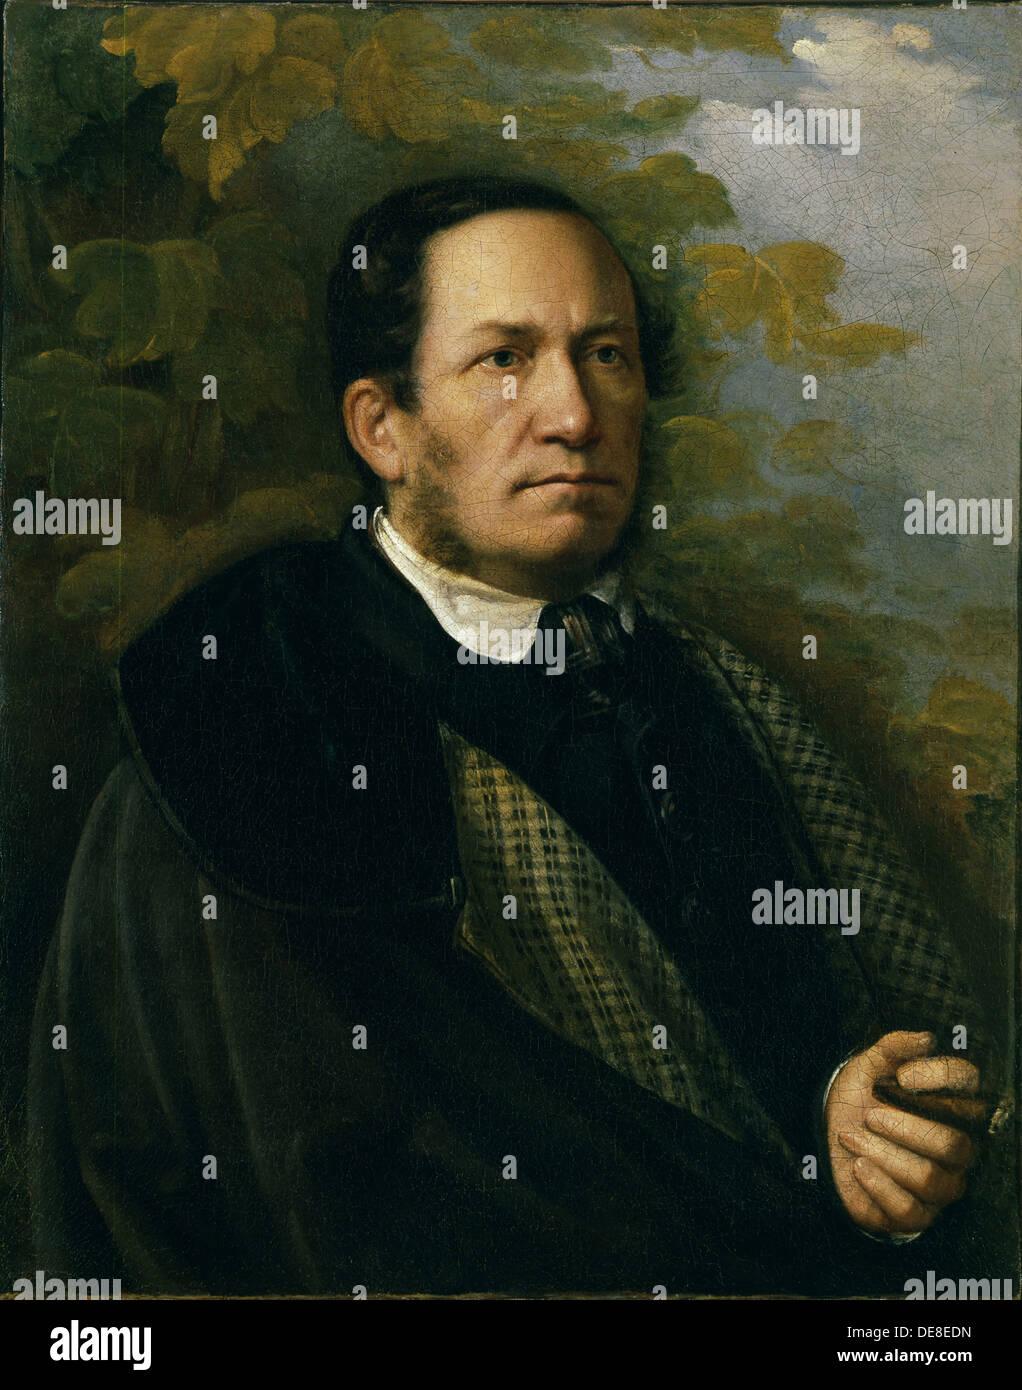 Portrait of Valeryan Zhadovsky, 1843. Artist: Lavrov, Nikolai Andreevich (1820-1875) - Stock Image